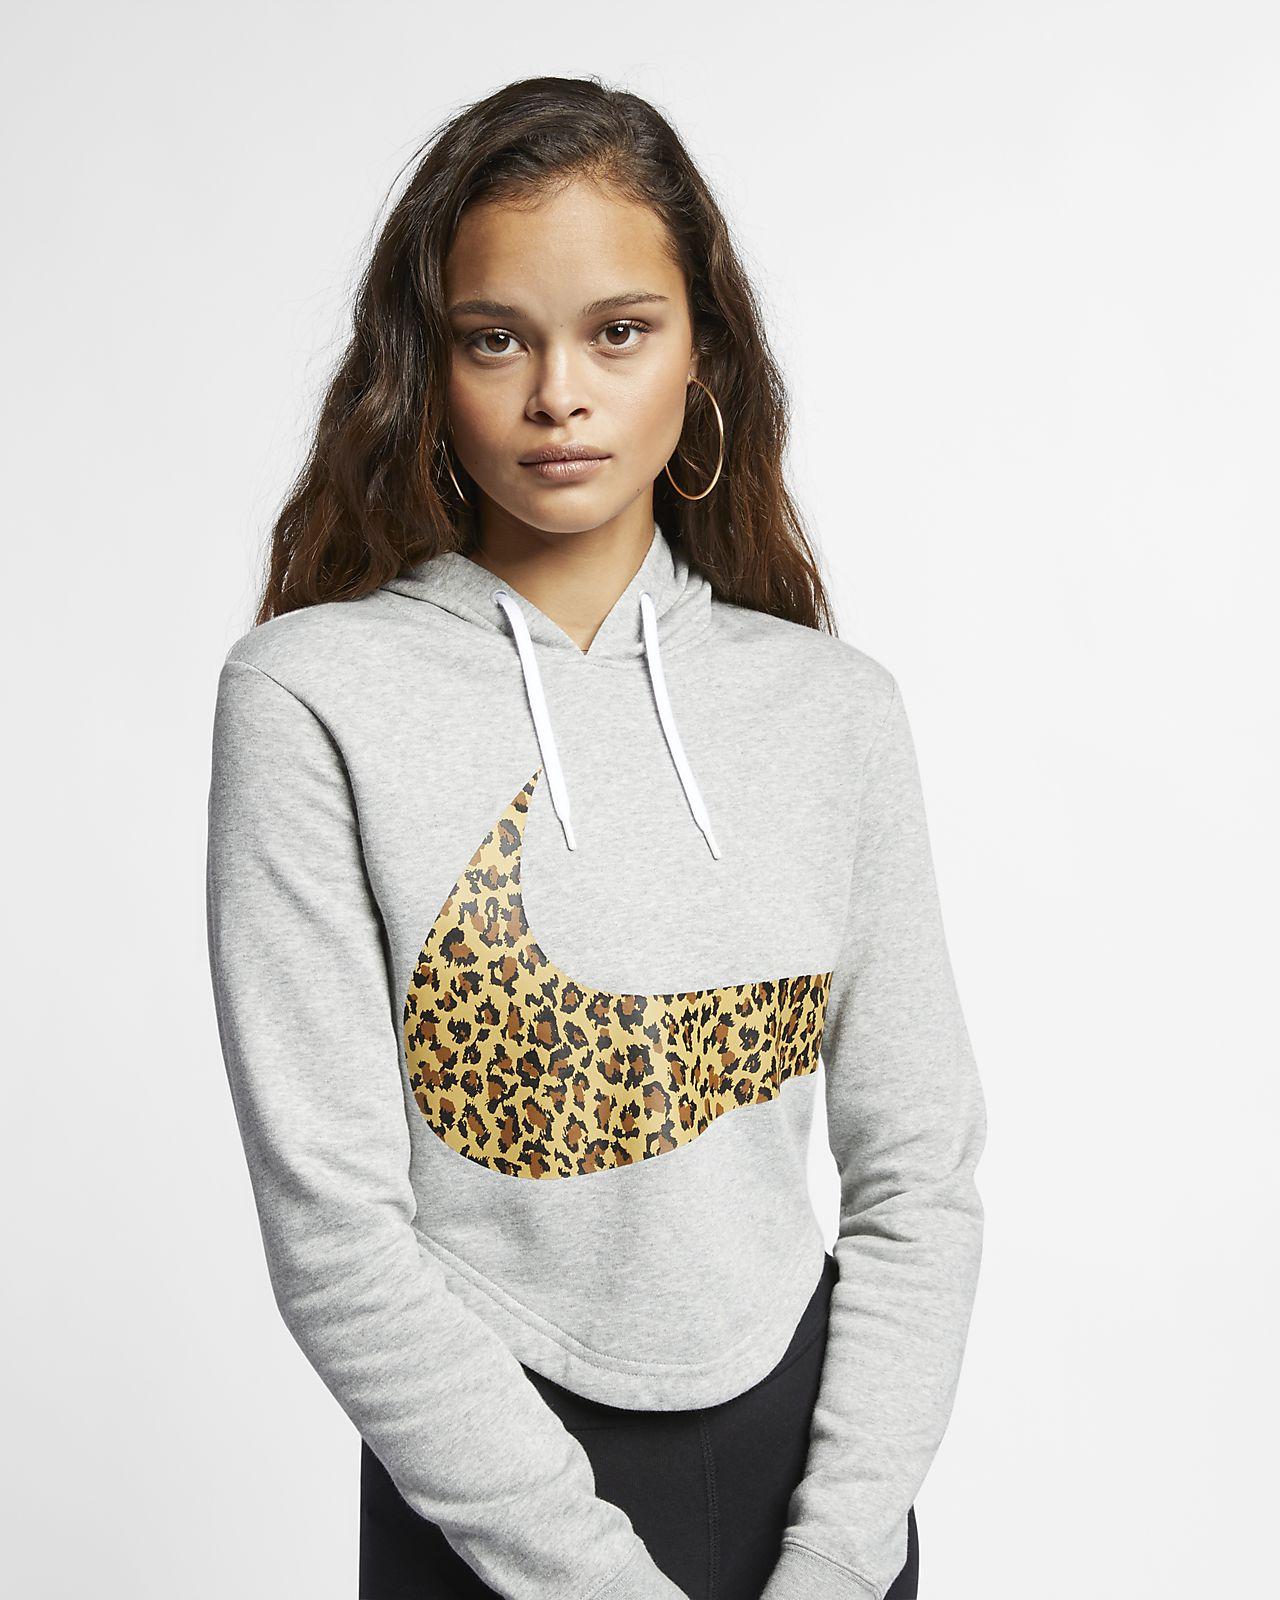 2dfe238a5dac ... Γυναικεία μπλούζα με κουκούλα και animal print σε κοντό μήκος Nike  Sportswear